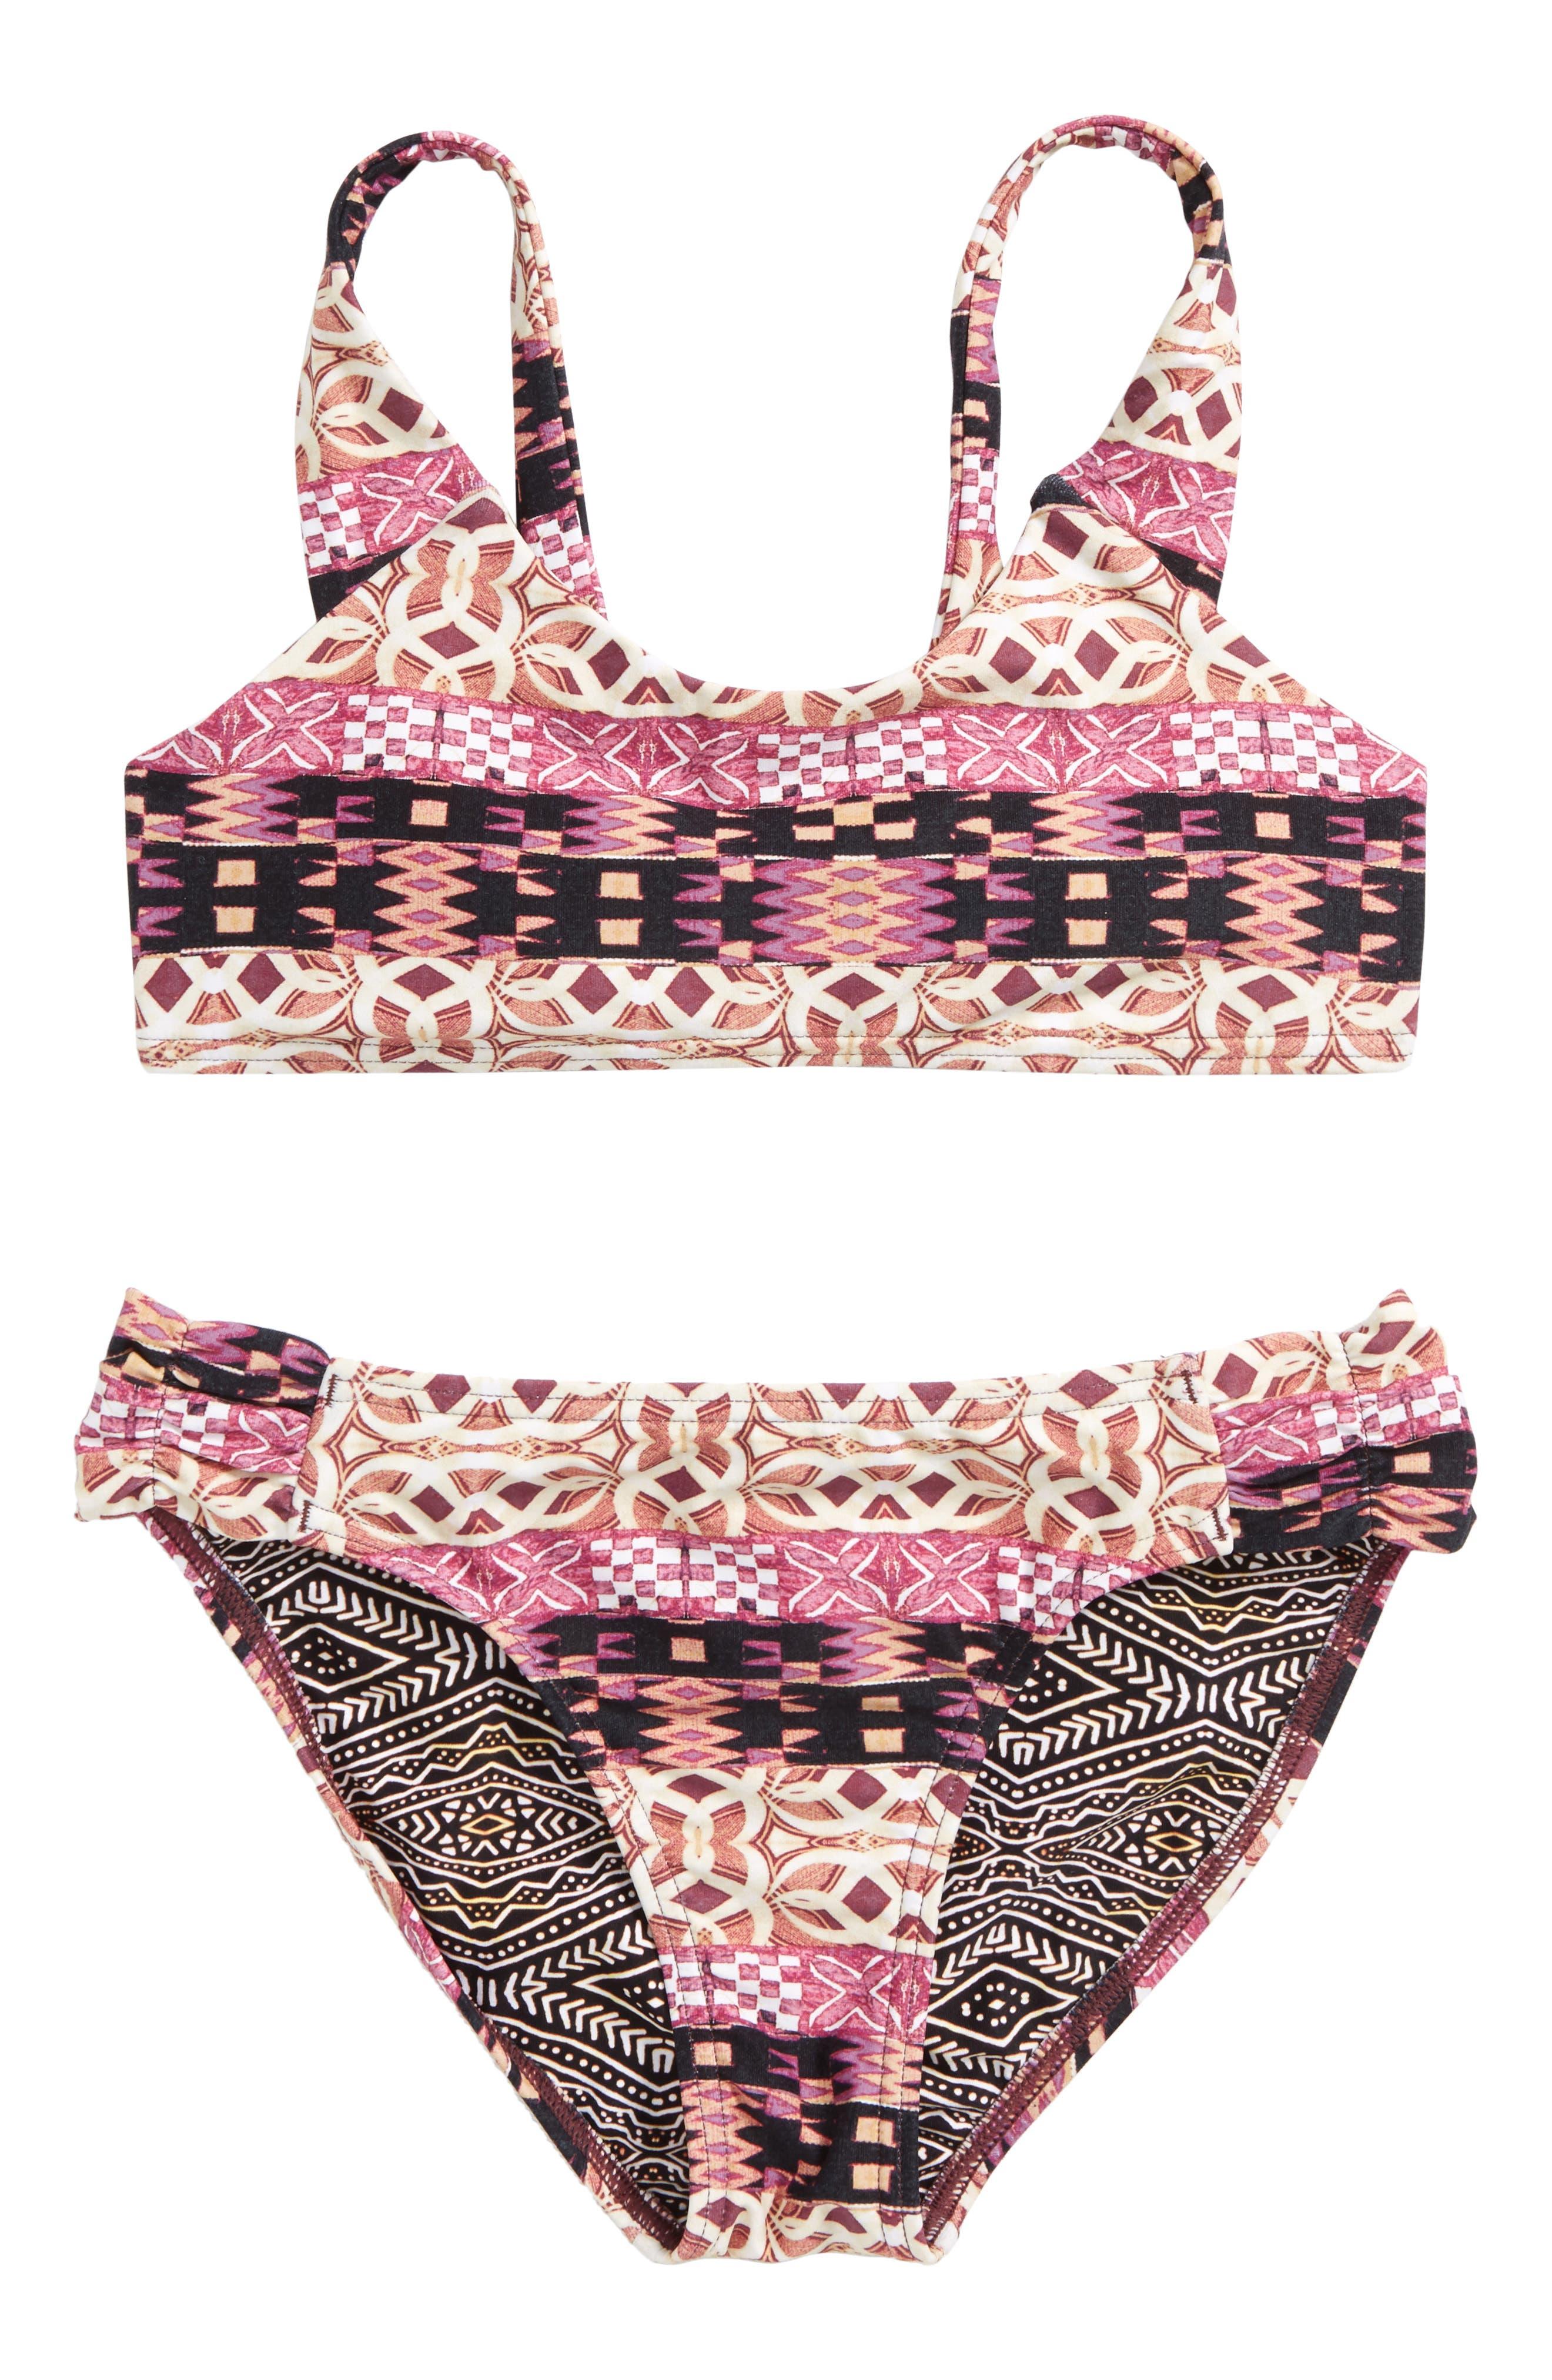 Main Image - O'Neill Zanzibar Reversible Two-Piece Swimsuit (Big GIrls)